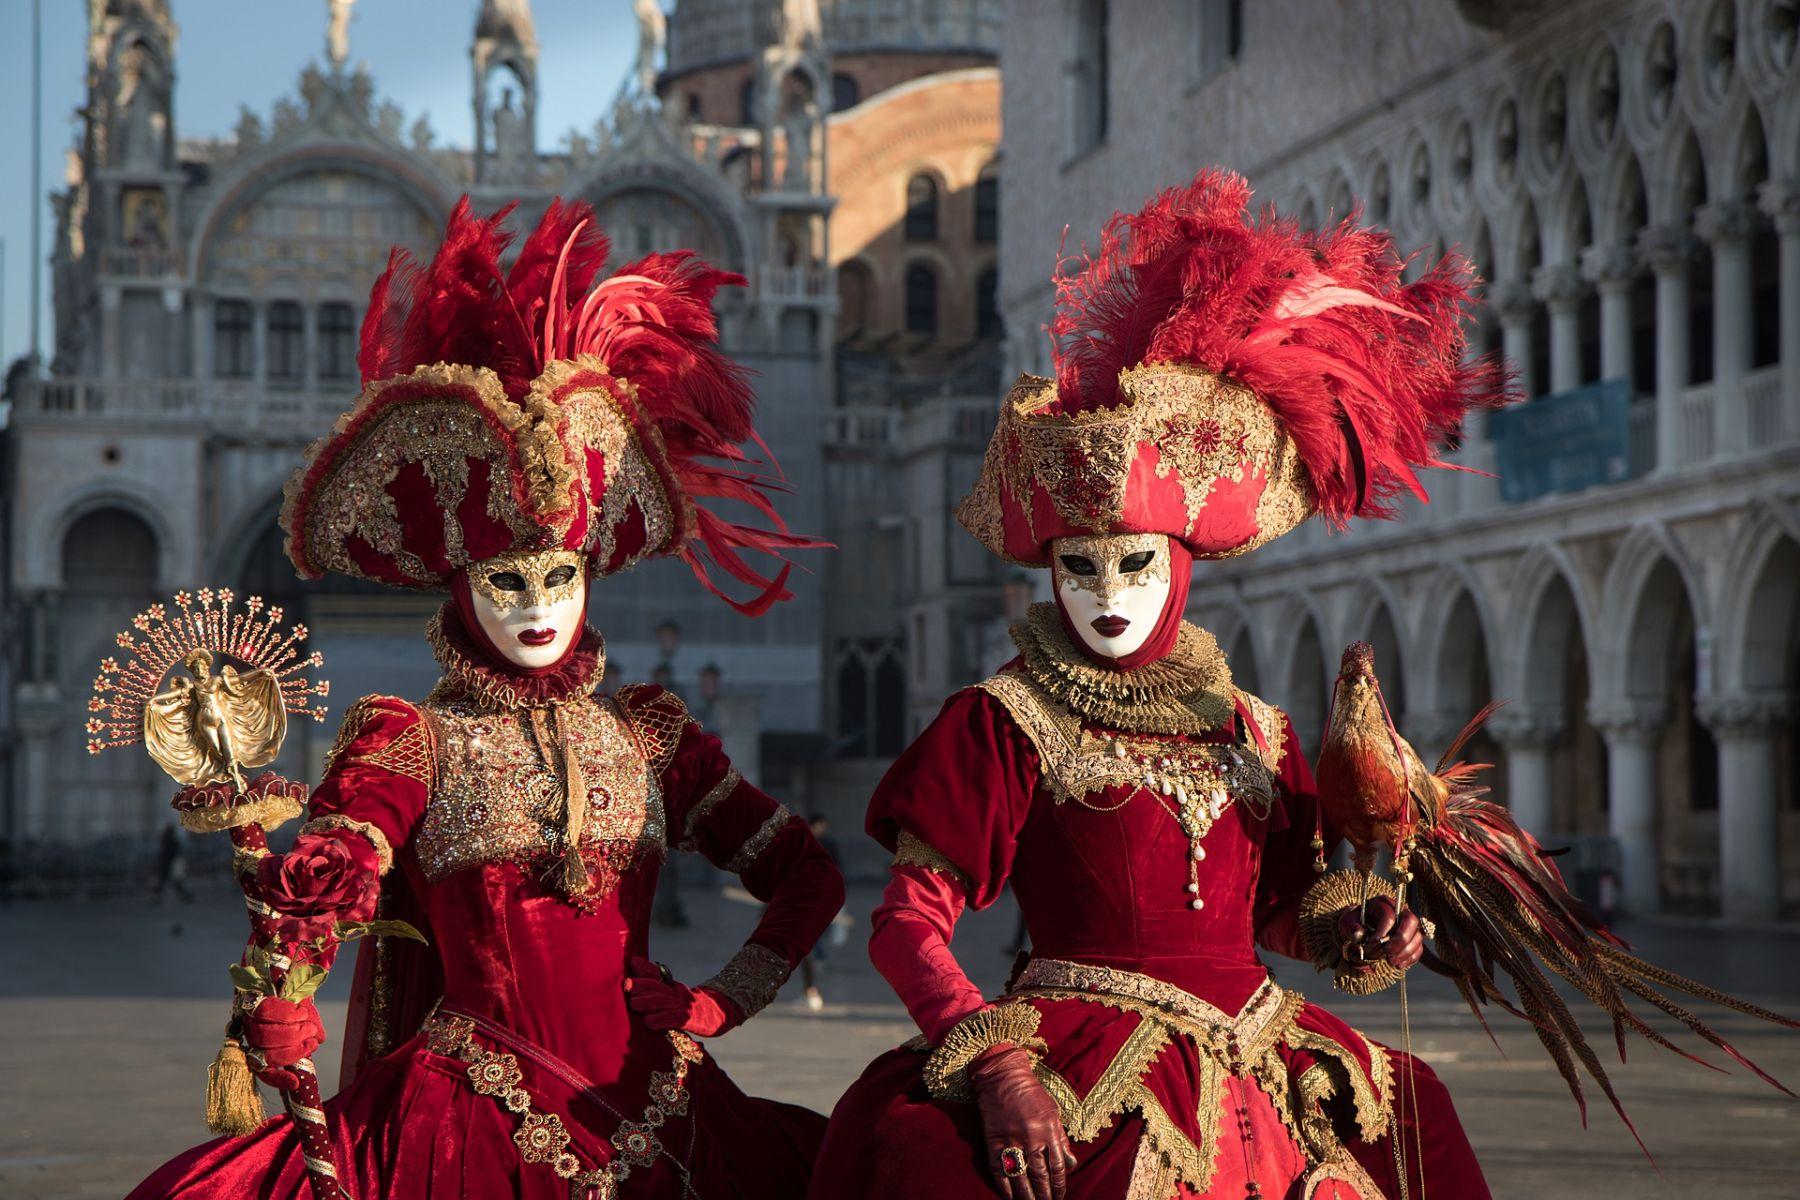 storia-del-carnevale-di-venezia-dooid